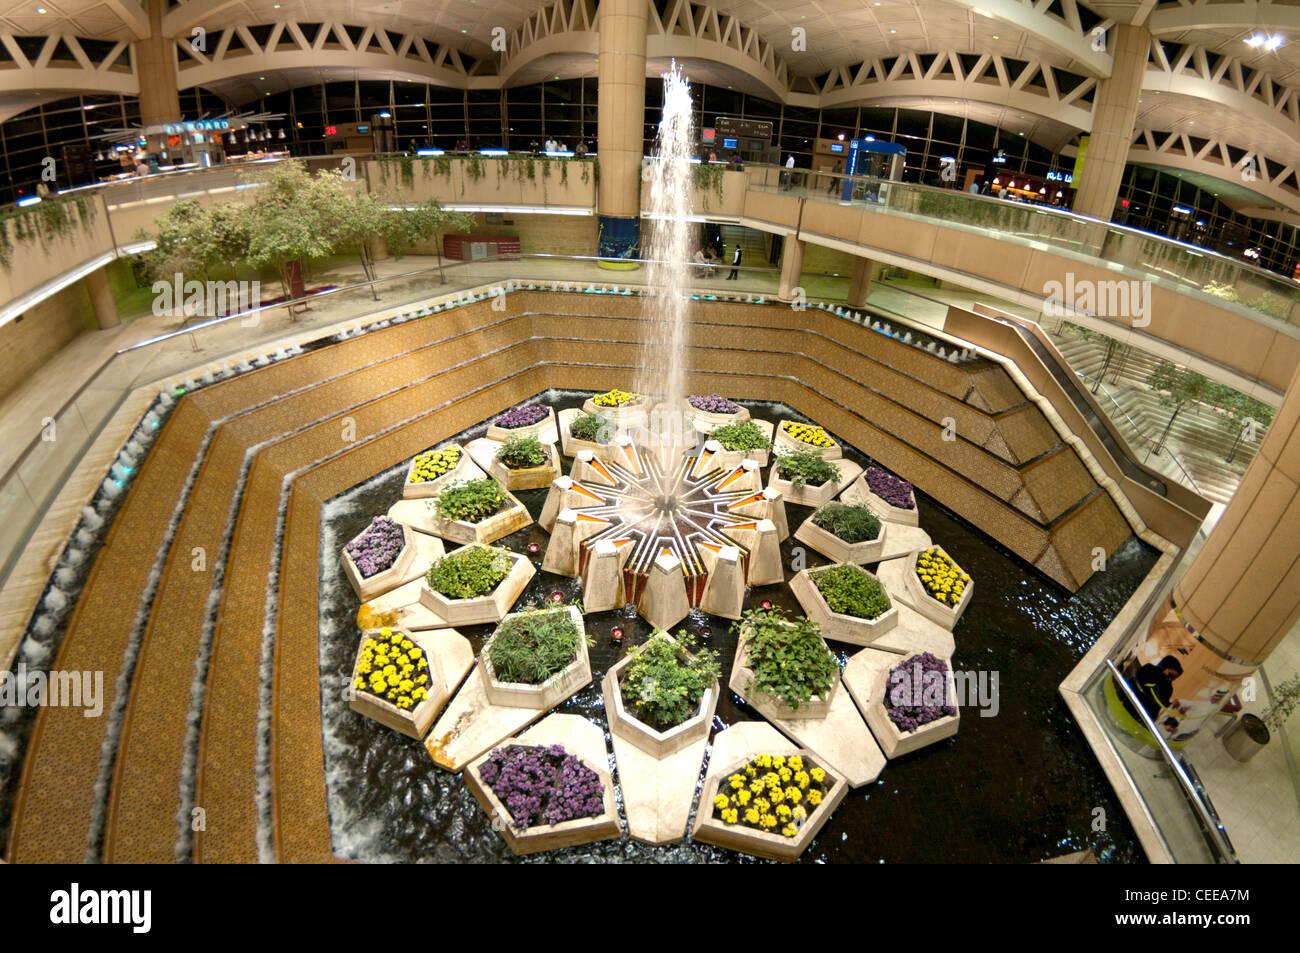 Una fontana presso il King Khaled Aeroporto in Riyadh, Arabia Saudita Immagini Stock